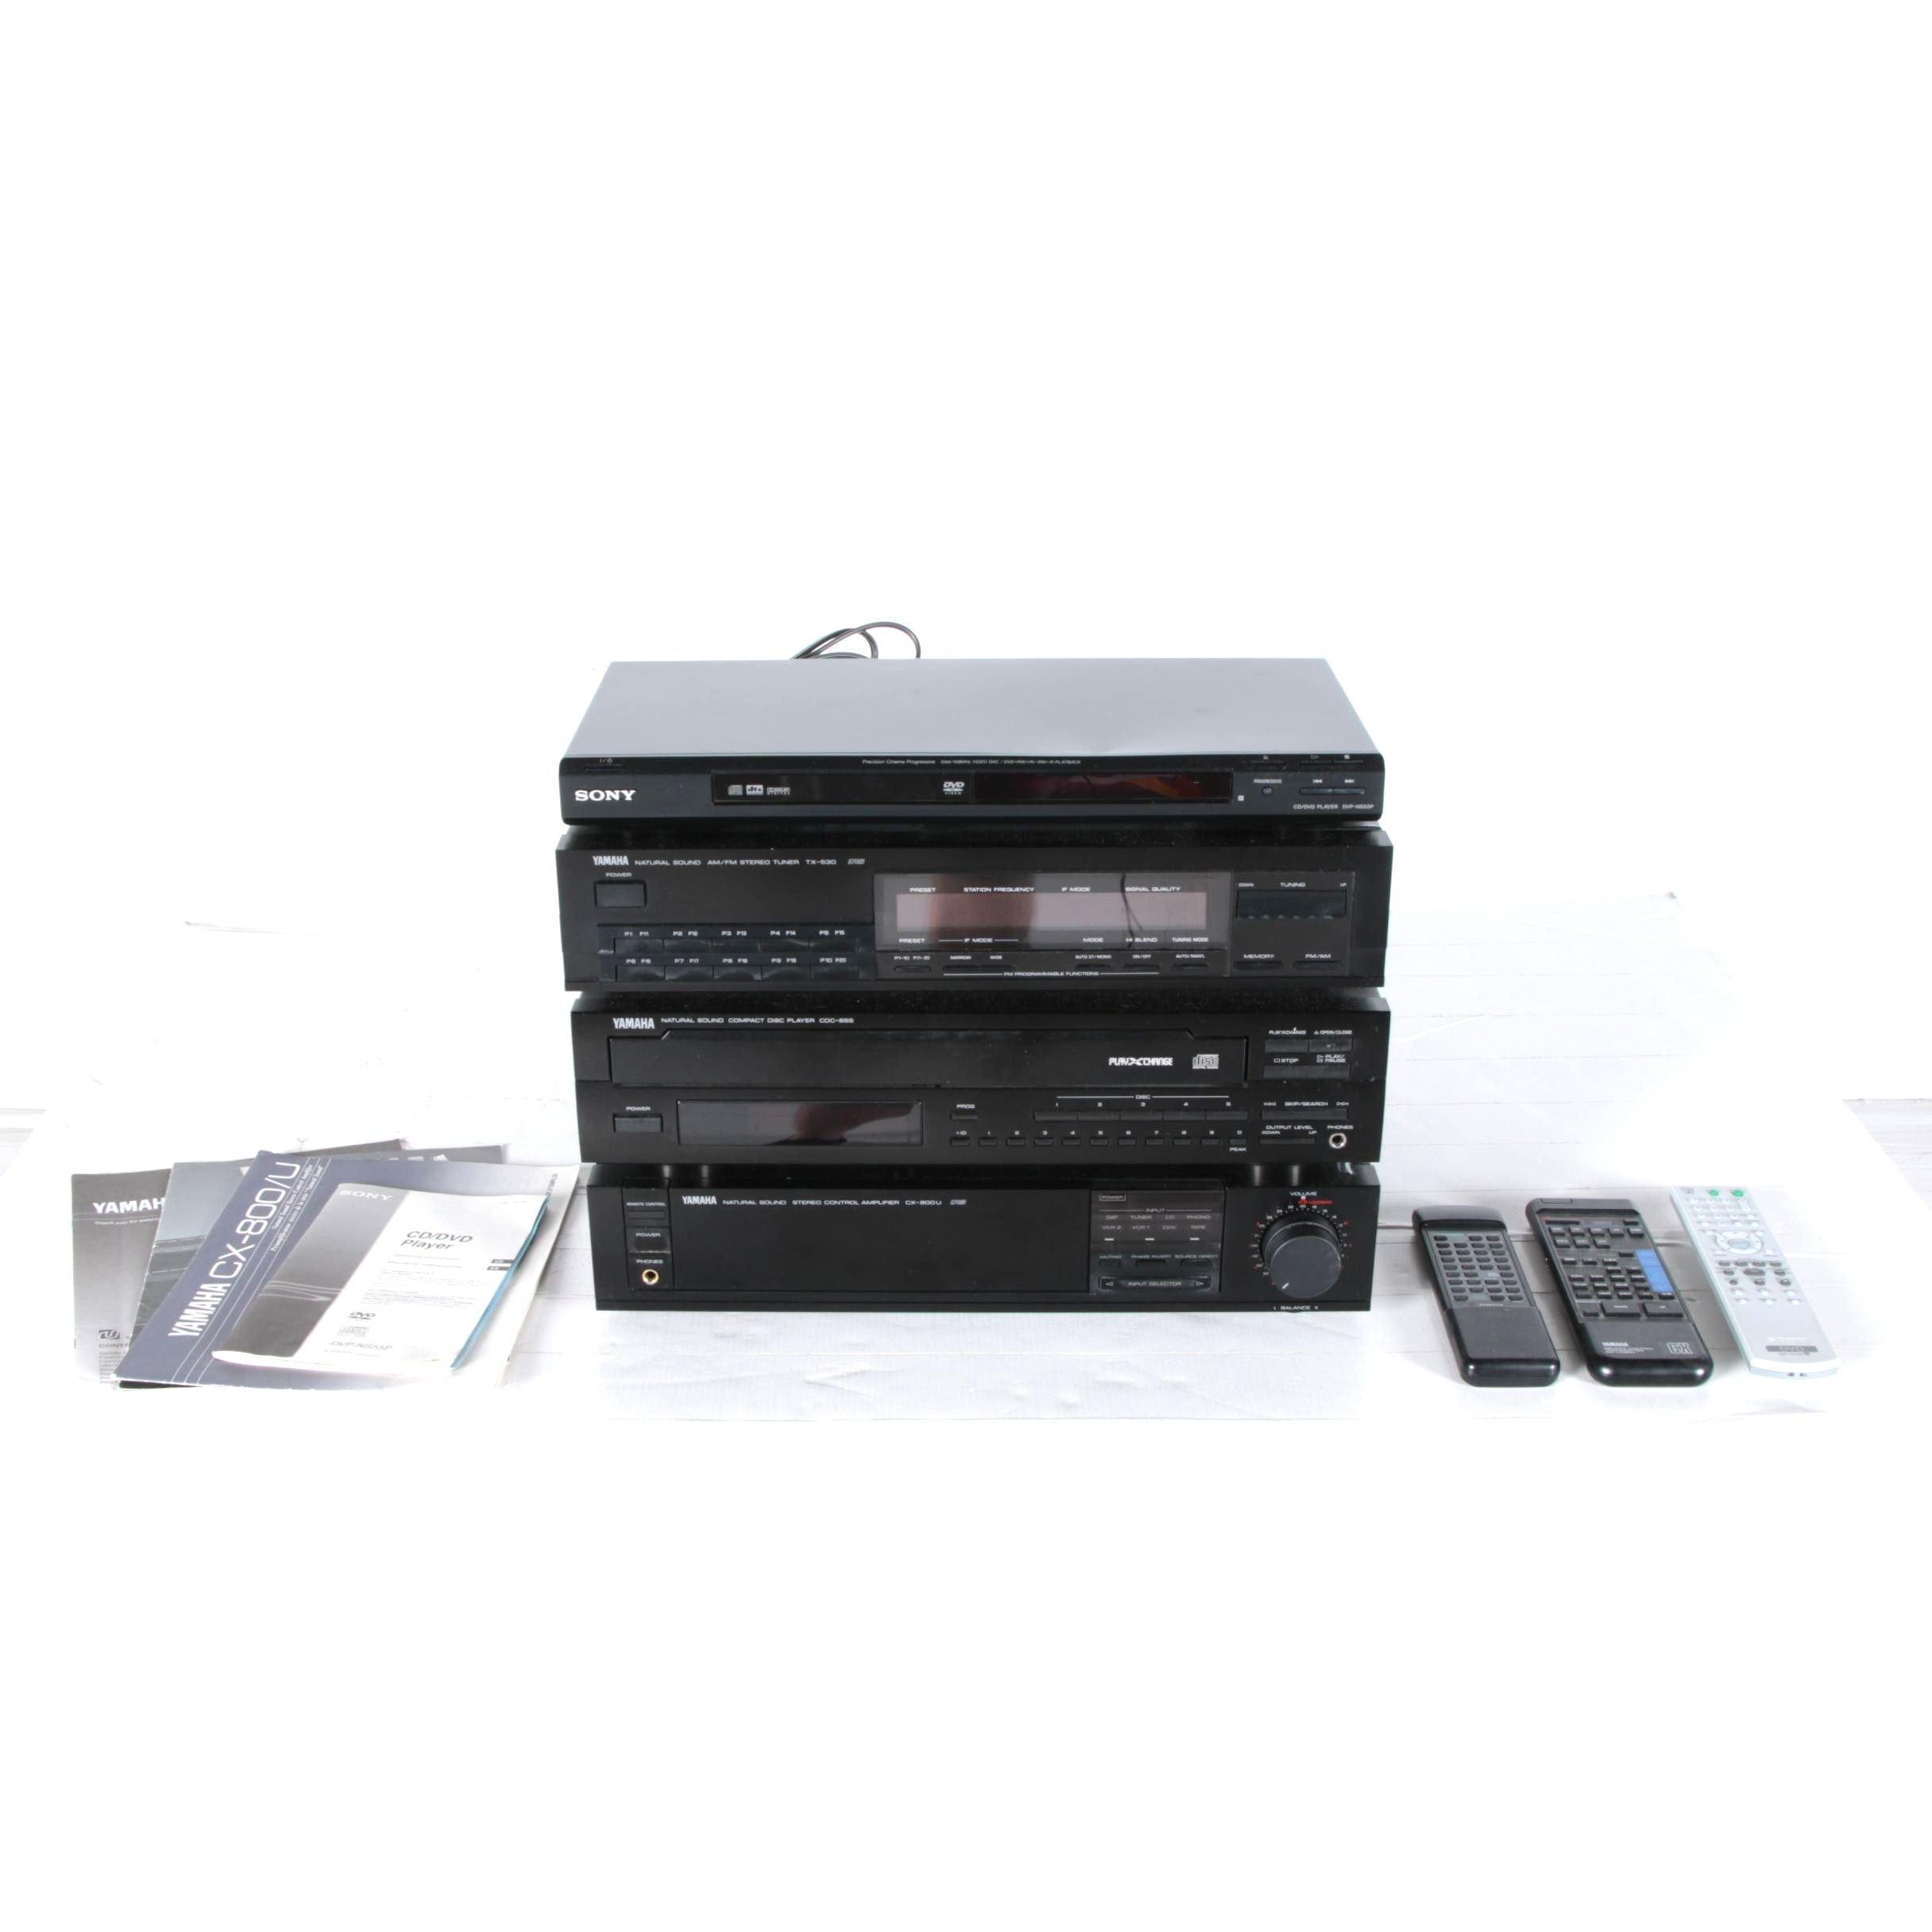 Yamaha and Sony Stereo Units